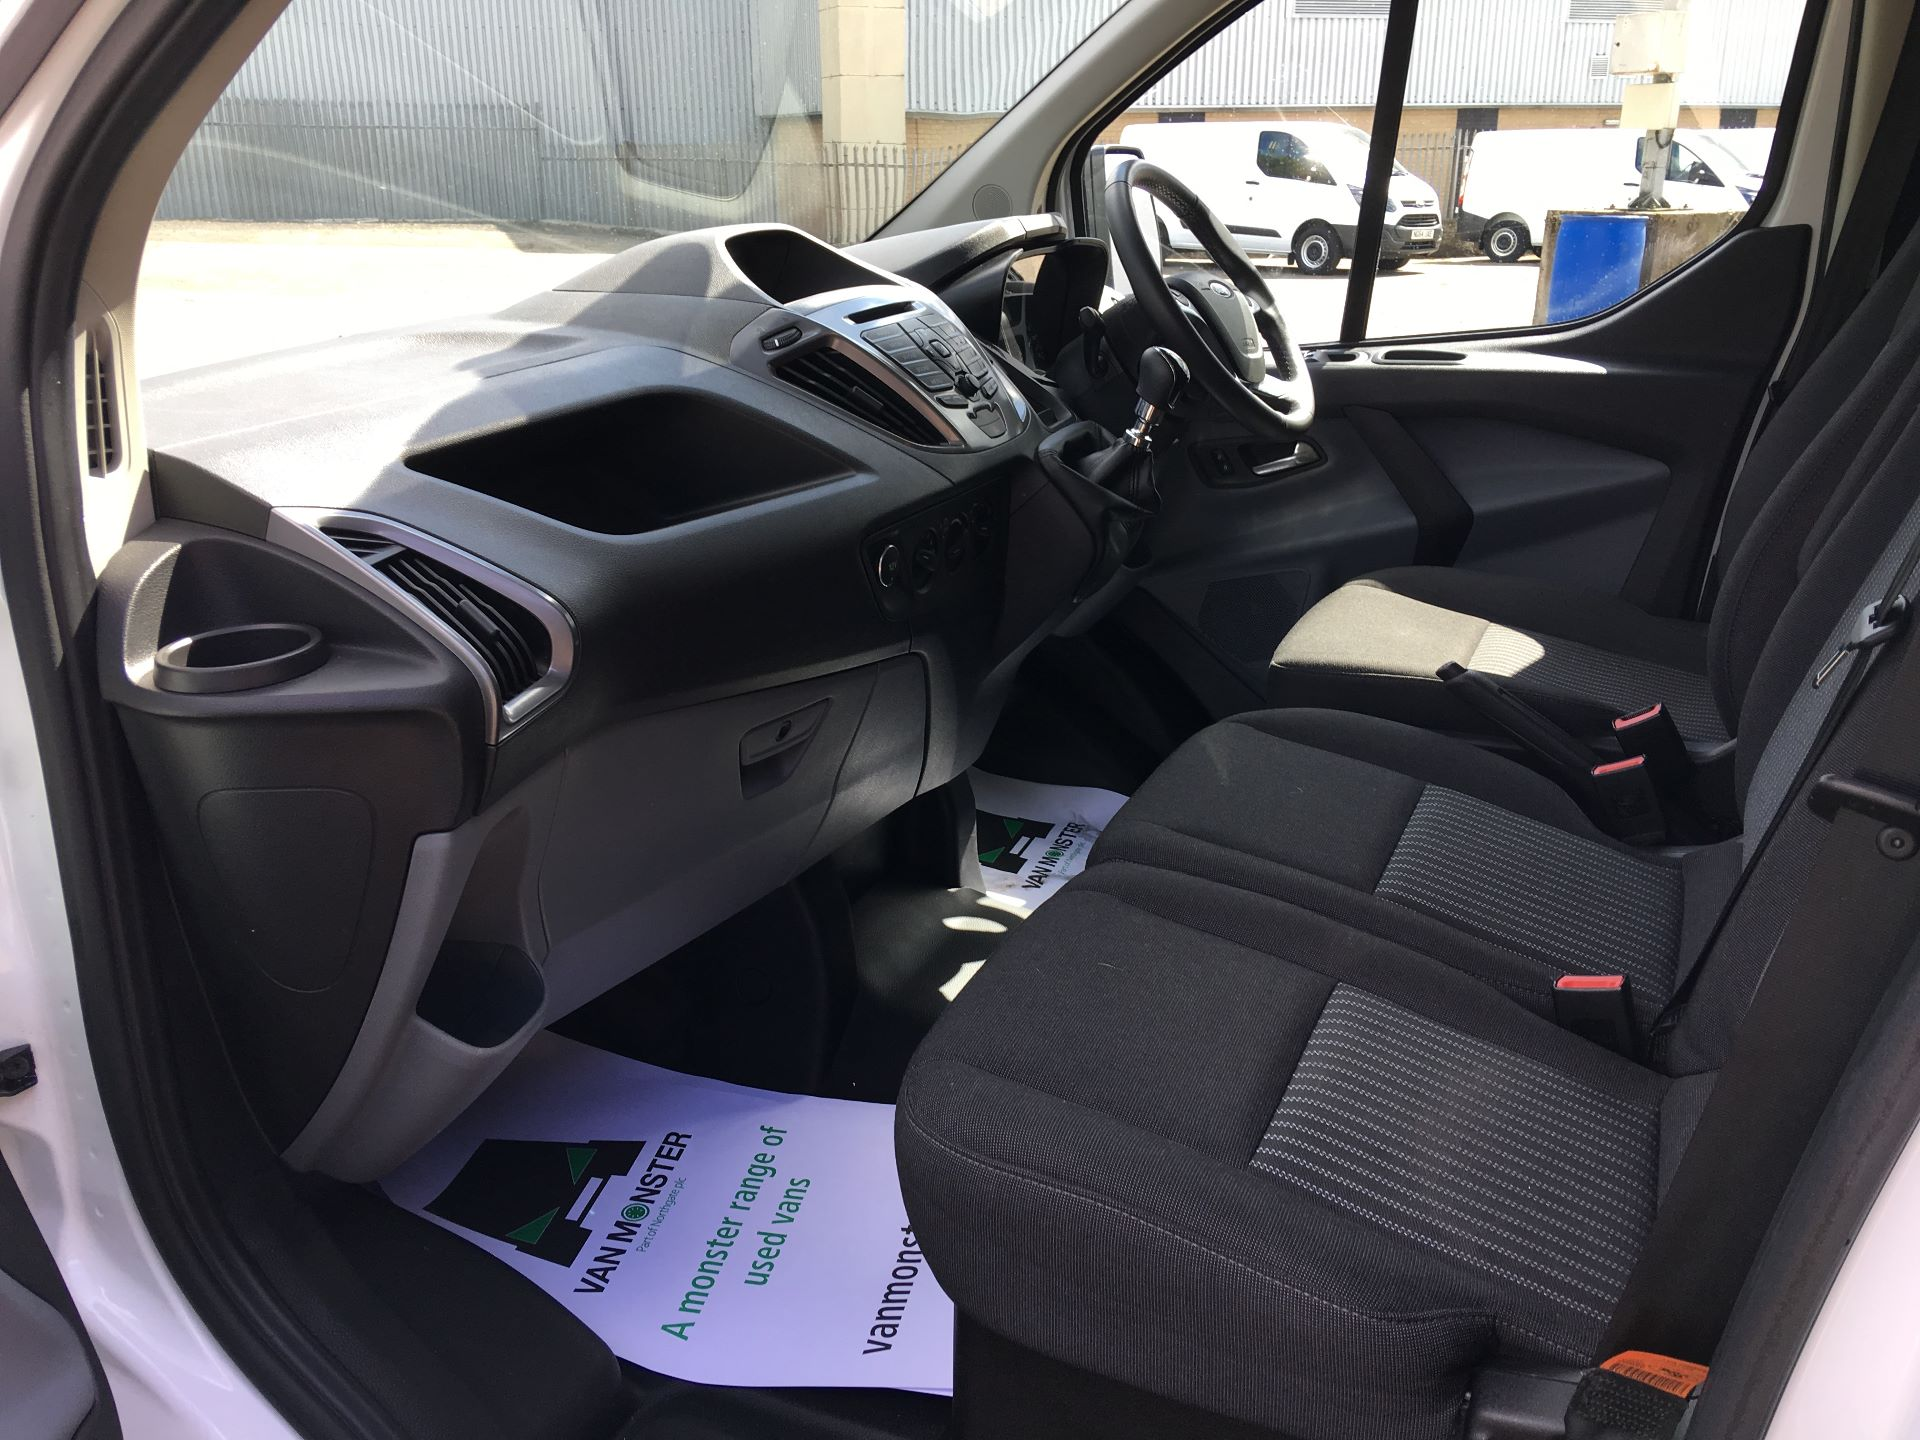 2018 Ford Transit Custom 290 L1 DIESEL FWD 2.0 TDCI 105PS LOW ROOF TREND EURO 6 (SH67VDK) Image 14